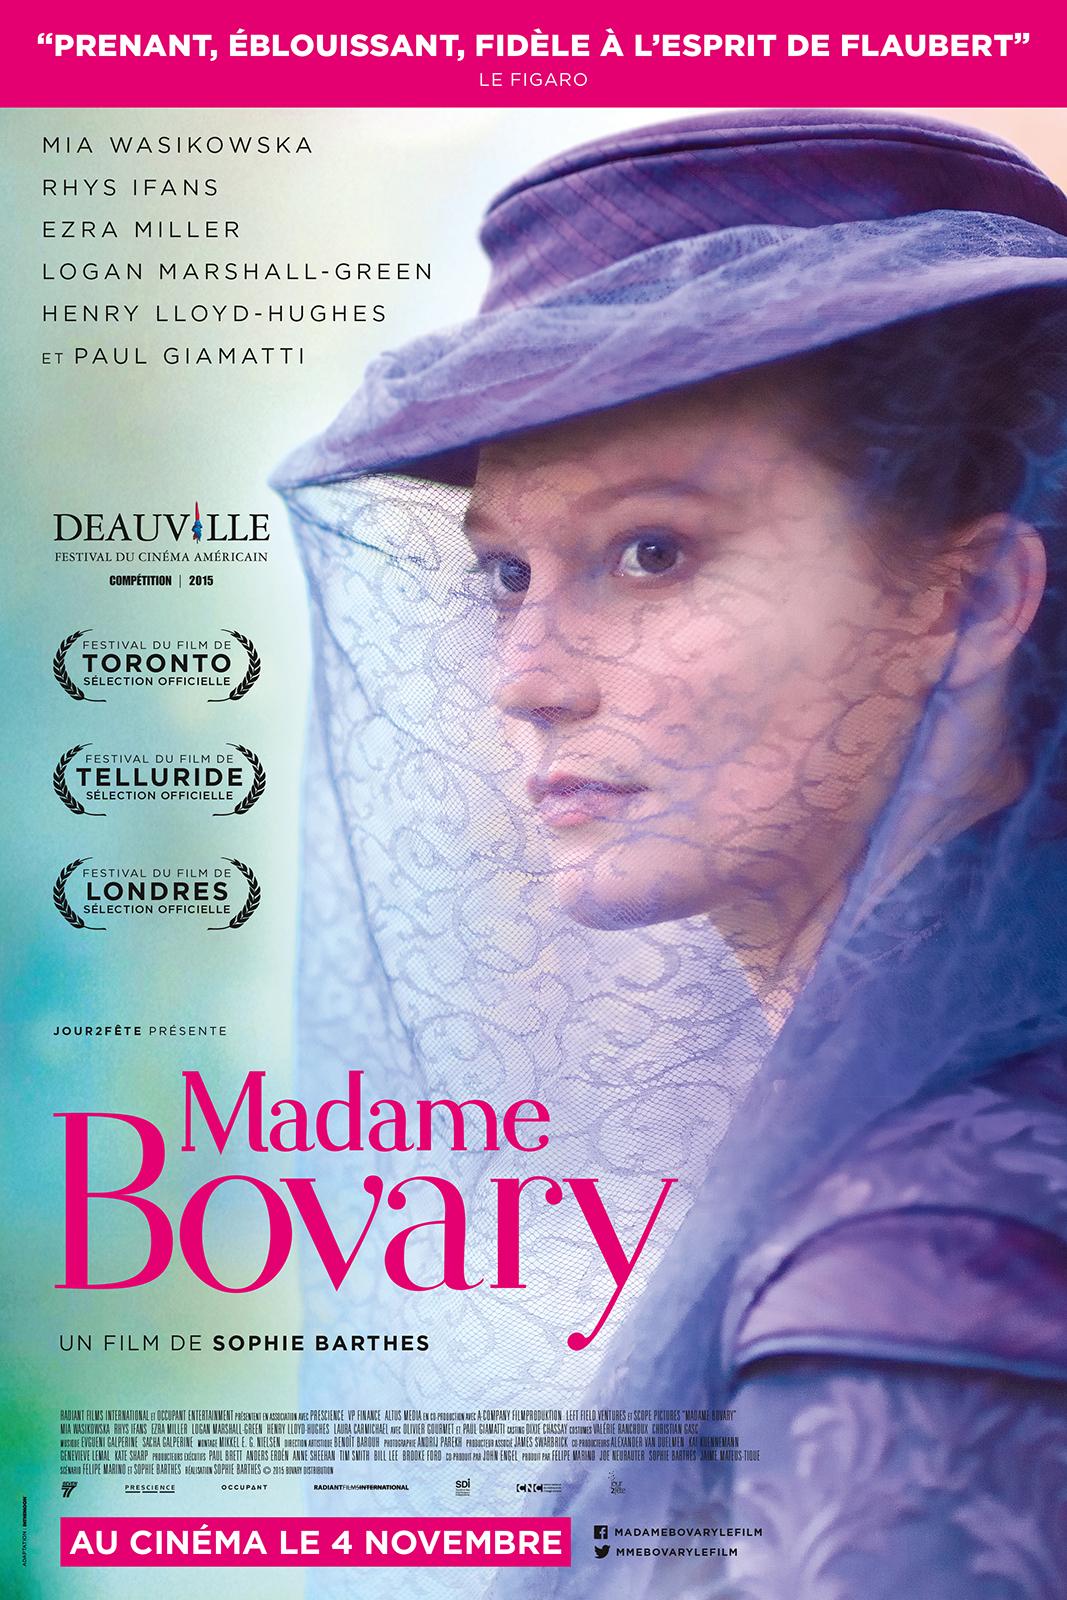 Madame Bovary ddl